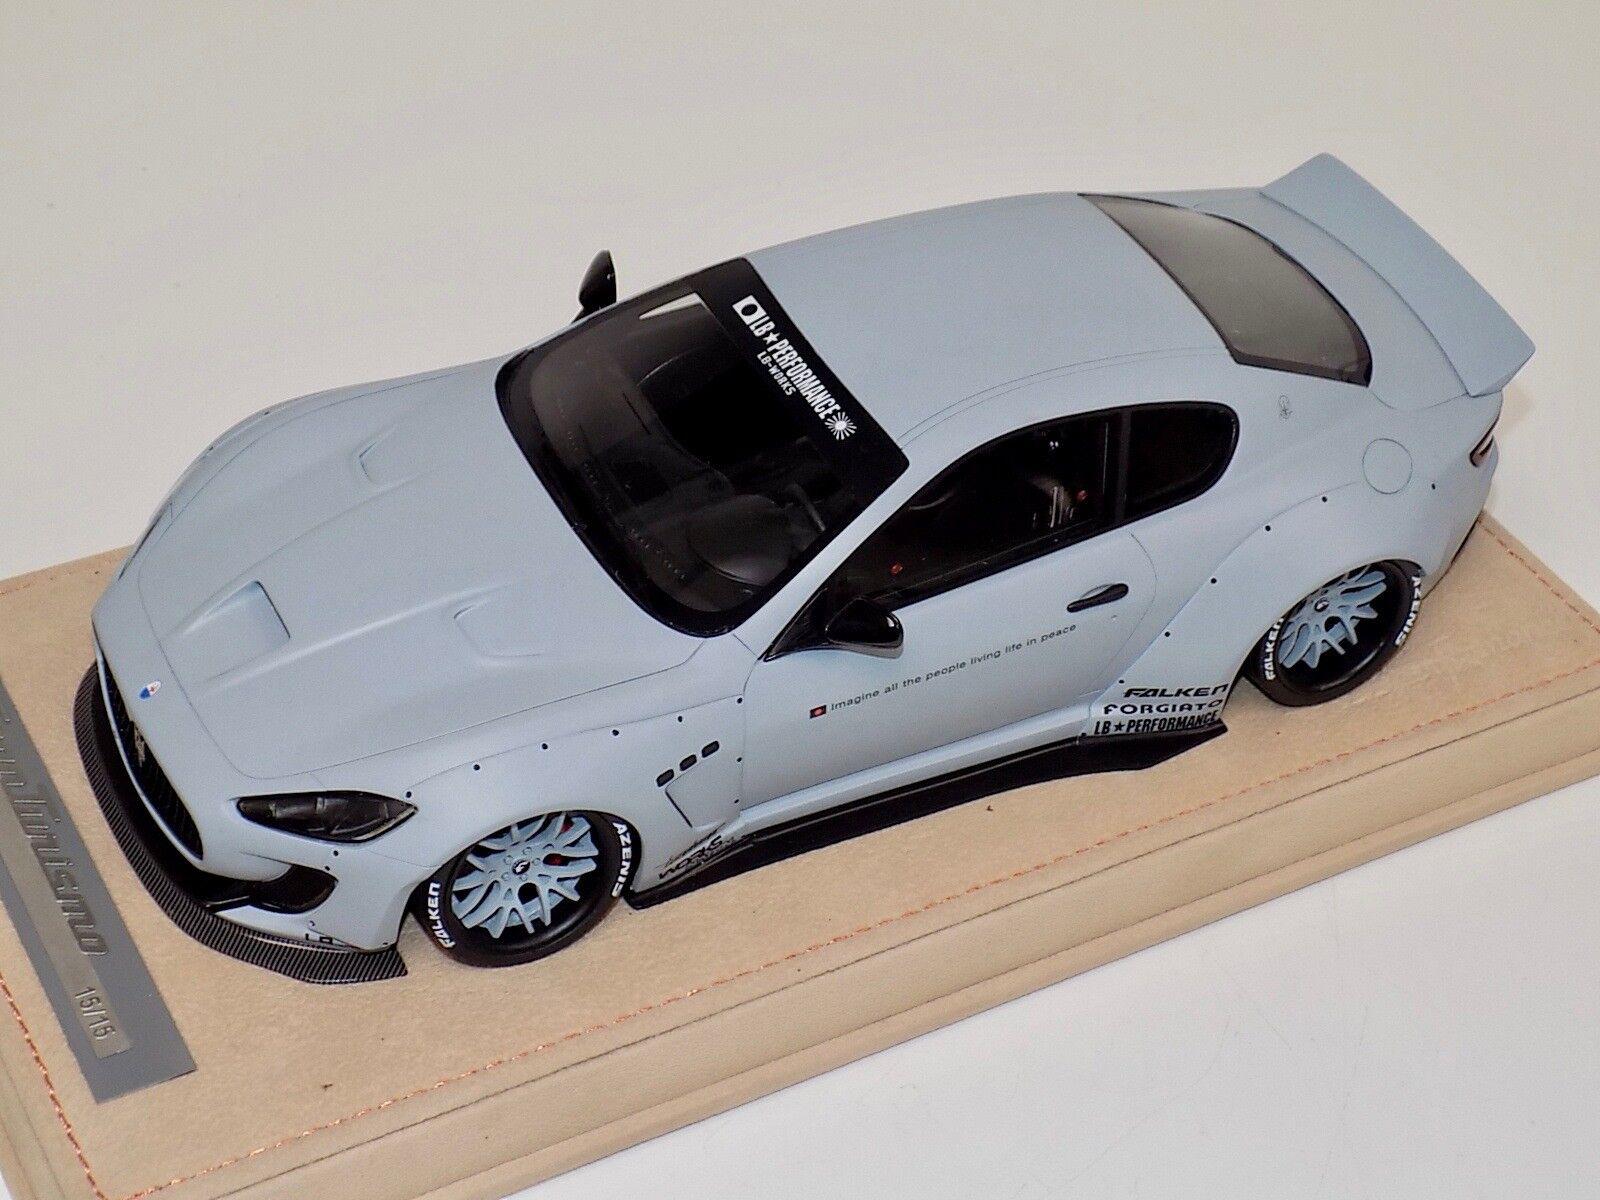 Modelos Maserati GranTurismo Liberty AB caminar Matt Coral ruedas Alcántara